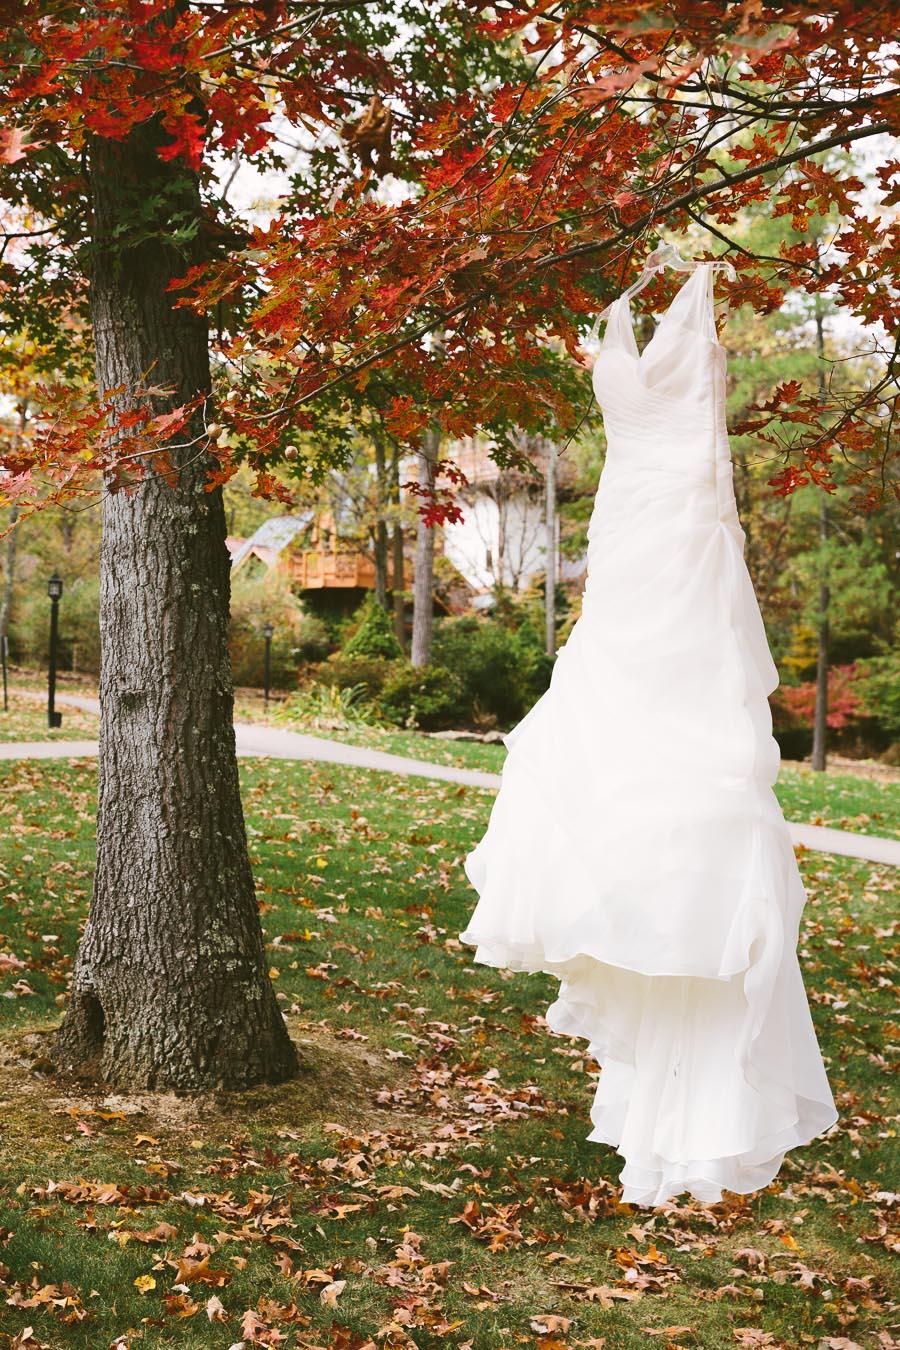 landolls-mohican-castle-wedding-photography-1.jpg